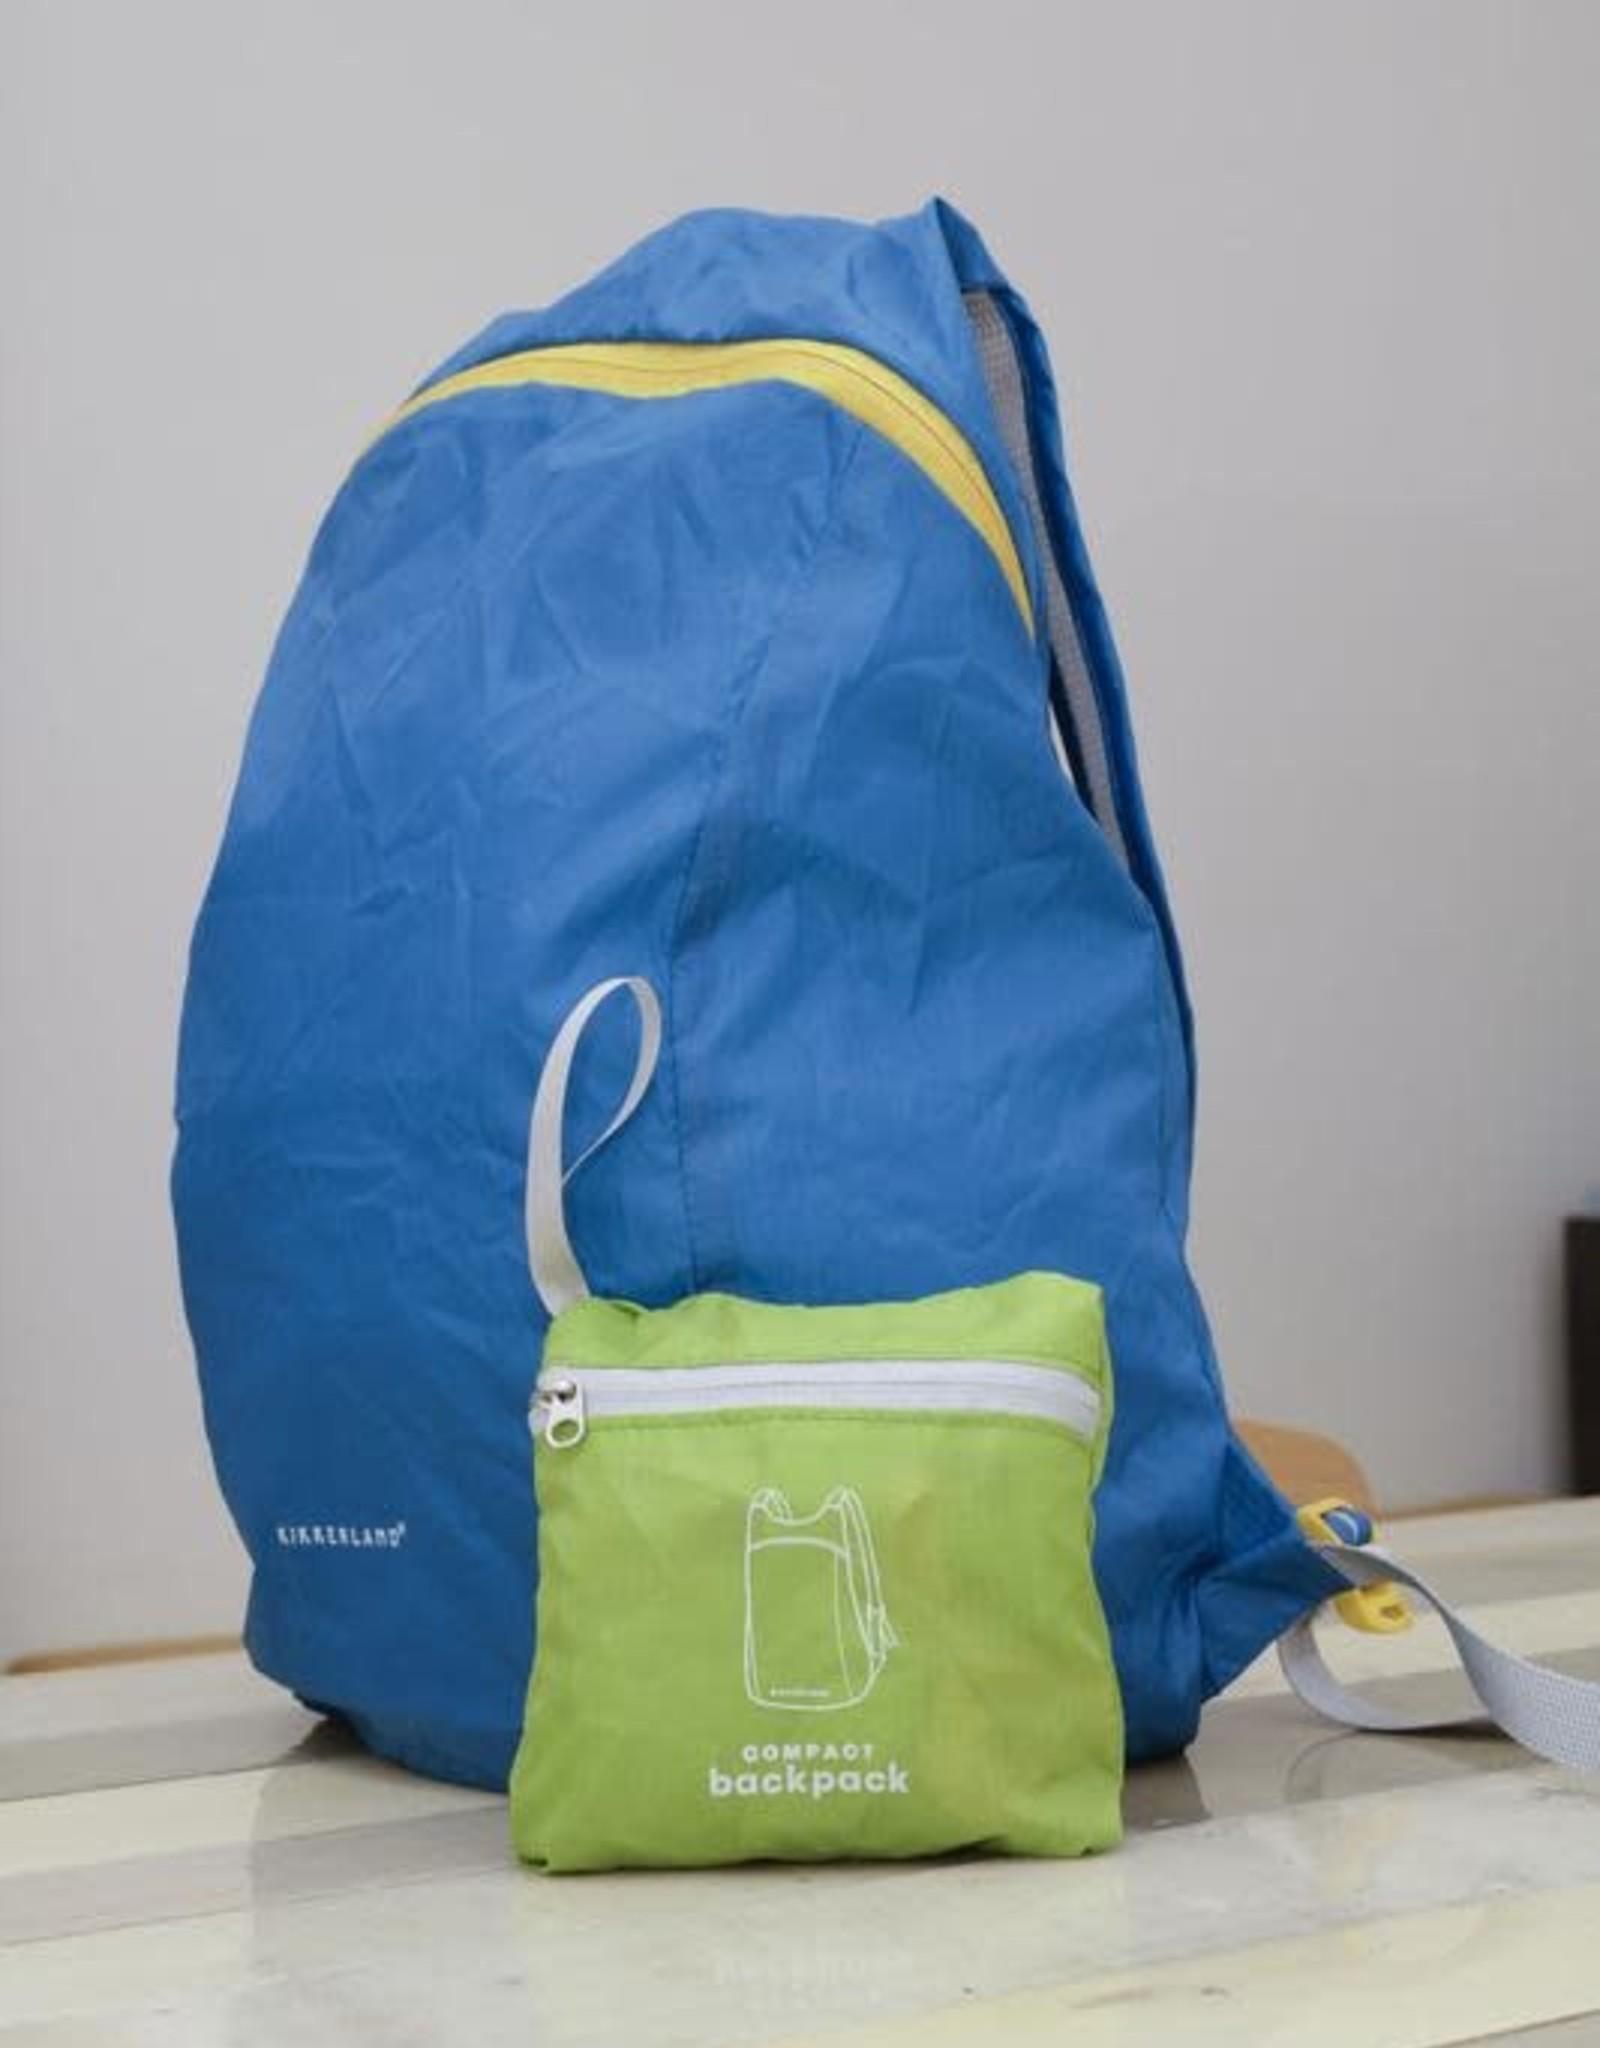 Kikkerland Compact Backpack